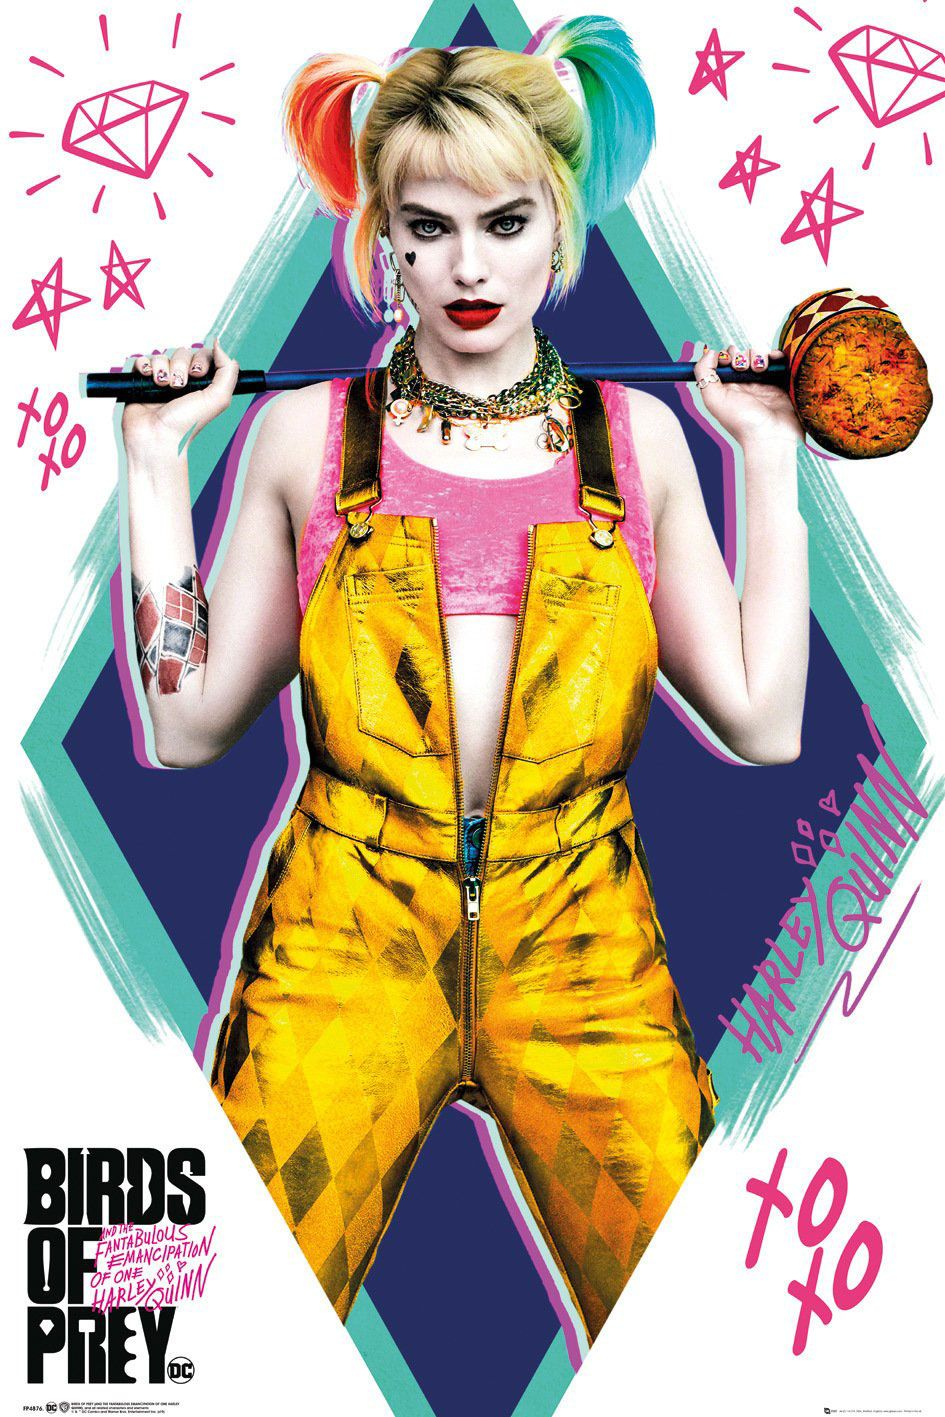 Birds of Prey Poster Pack Harley Quinn 61 x 91 cm (5)